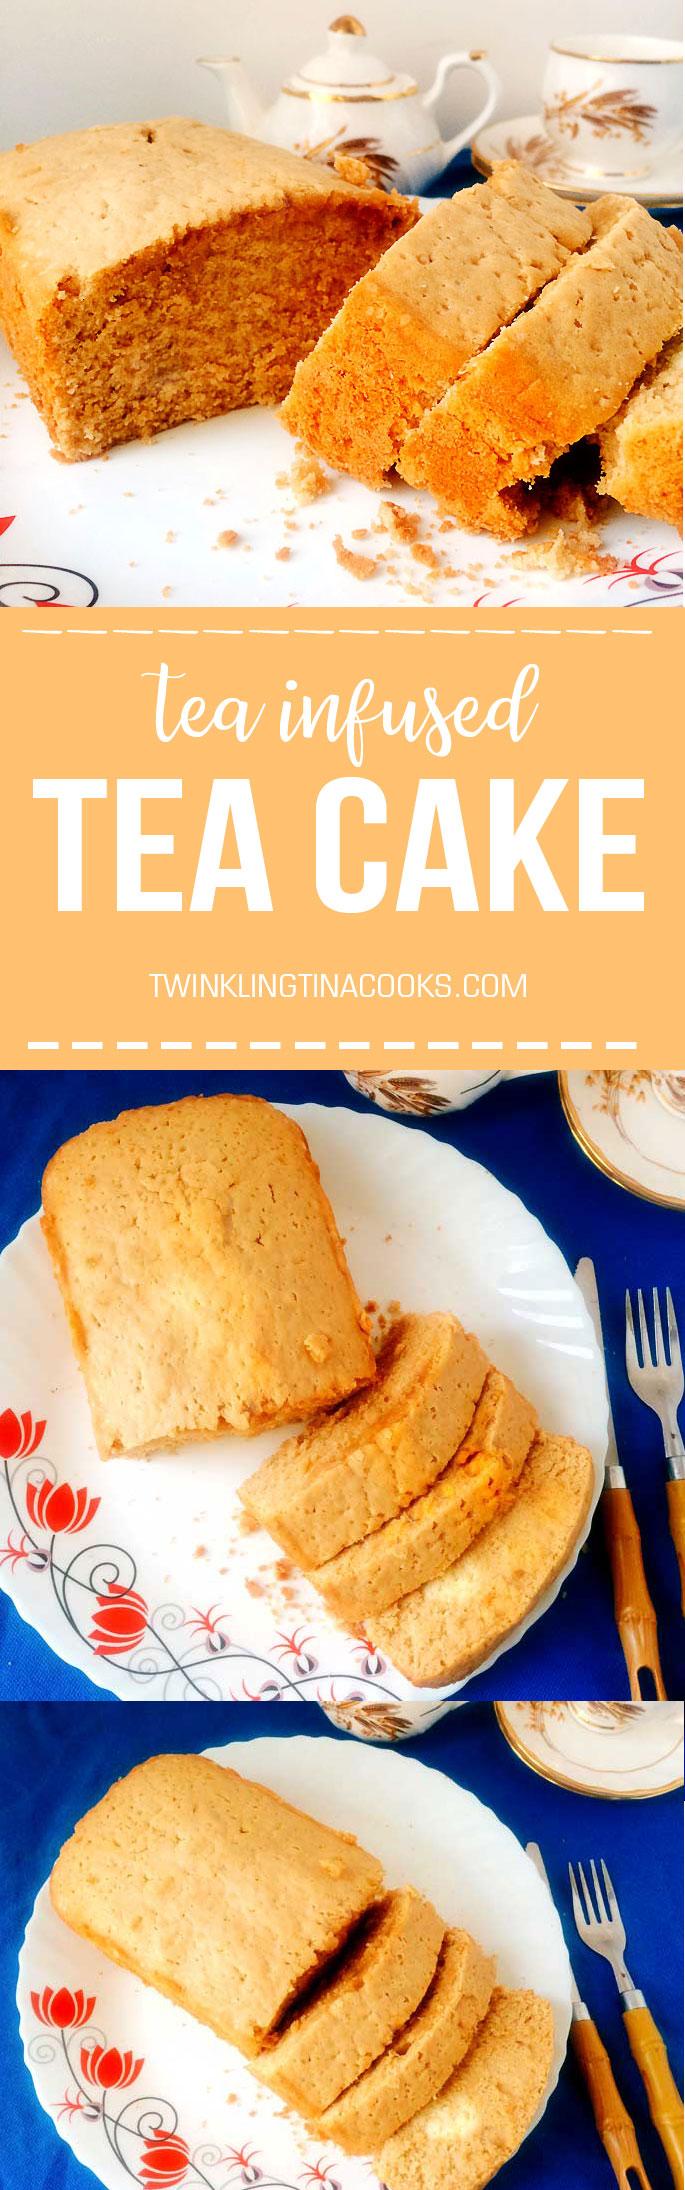 tea-infused-cake-recipe-dessert-pinterest